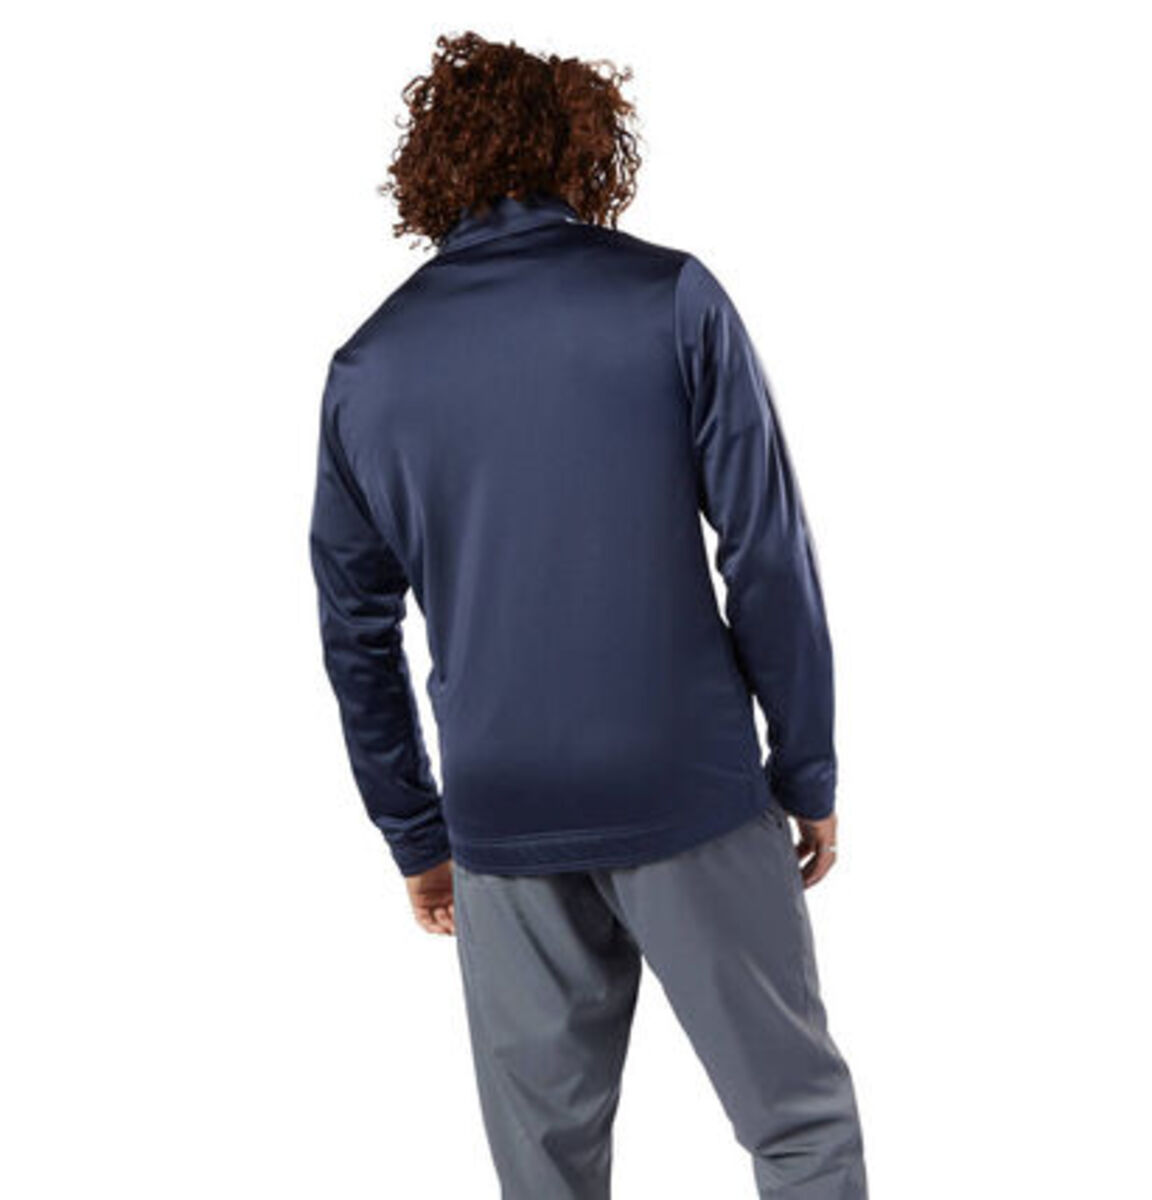 Bild 2 von Reebok Herren Trainingsjacke Linear Logo